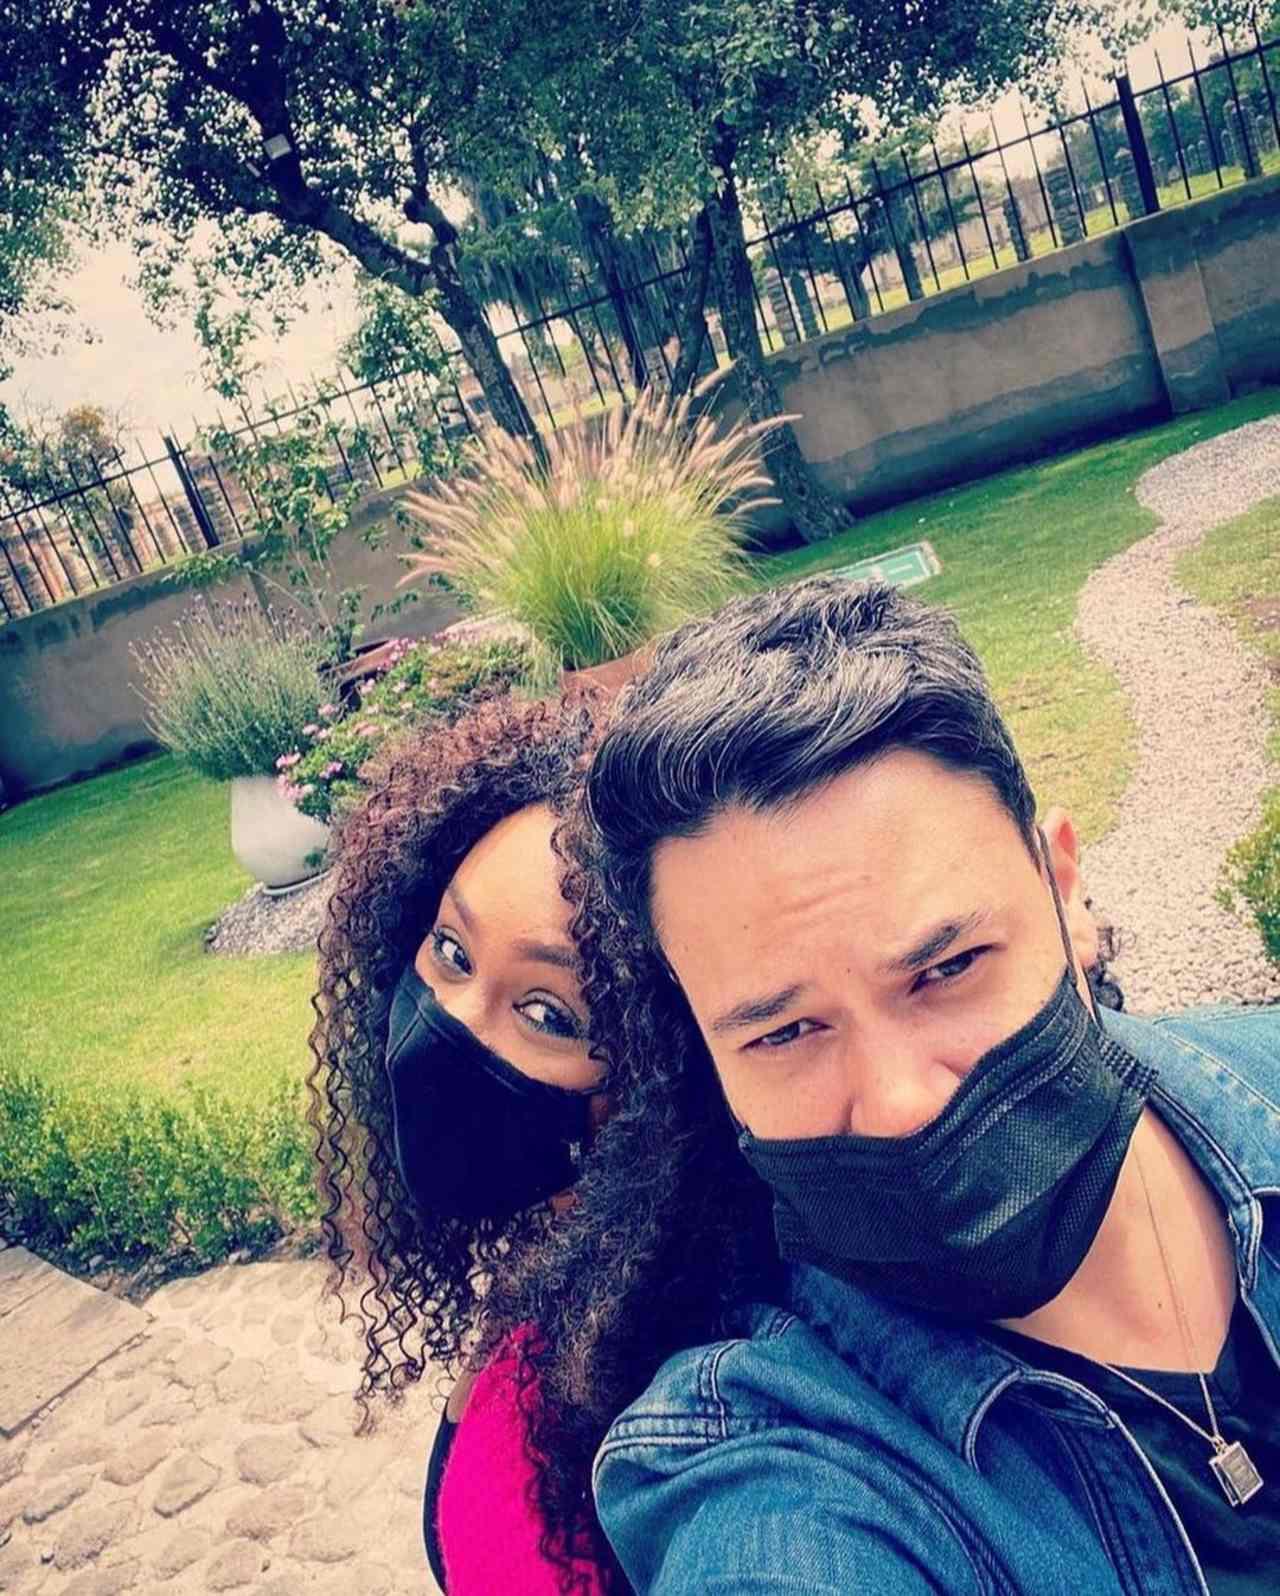 M'Balia muestra a su novia tras polémica con Lidia Ávila